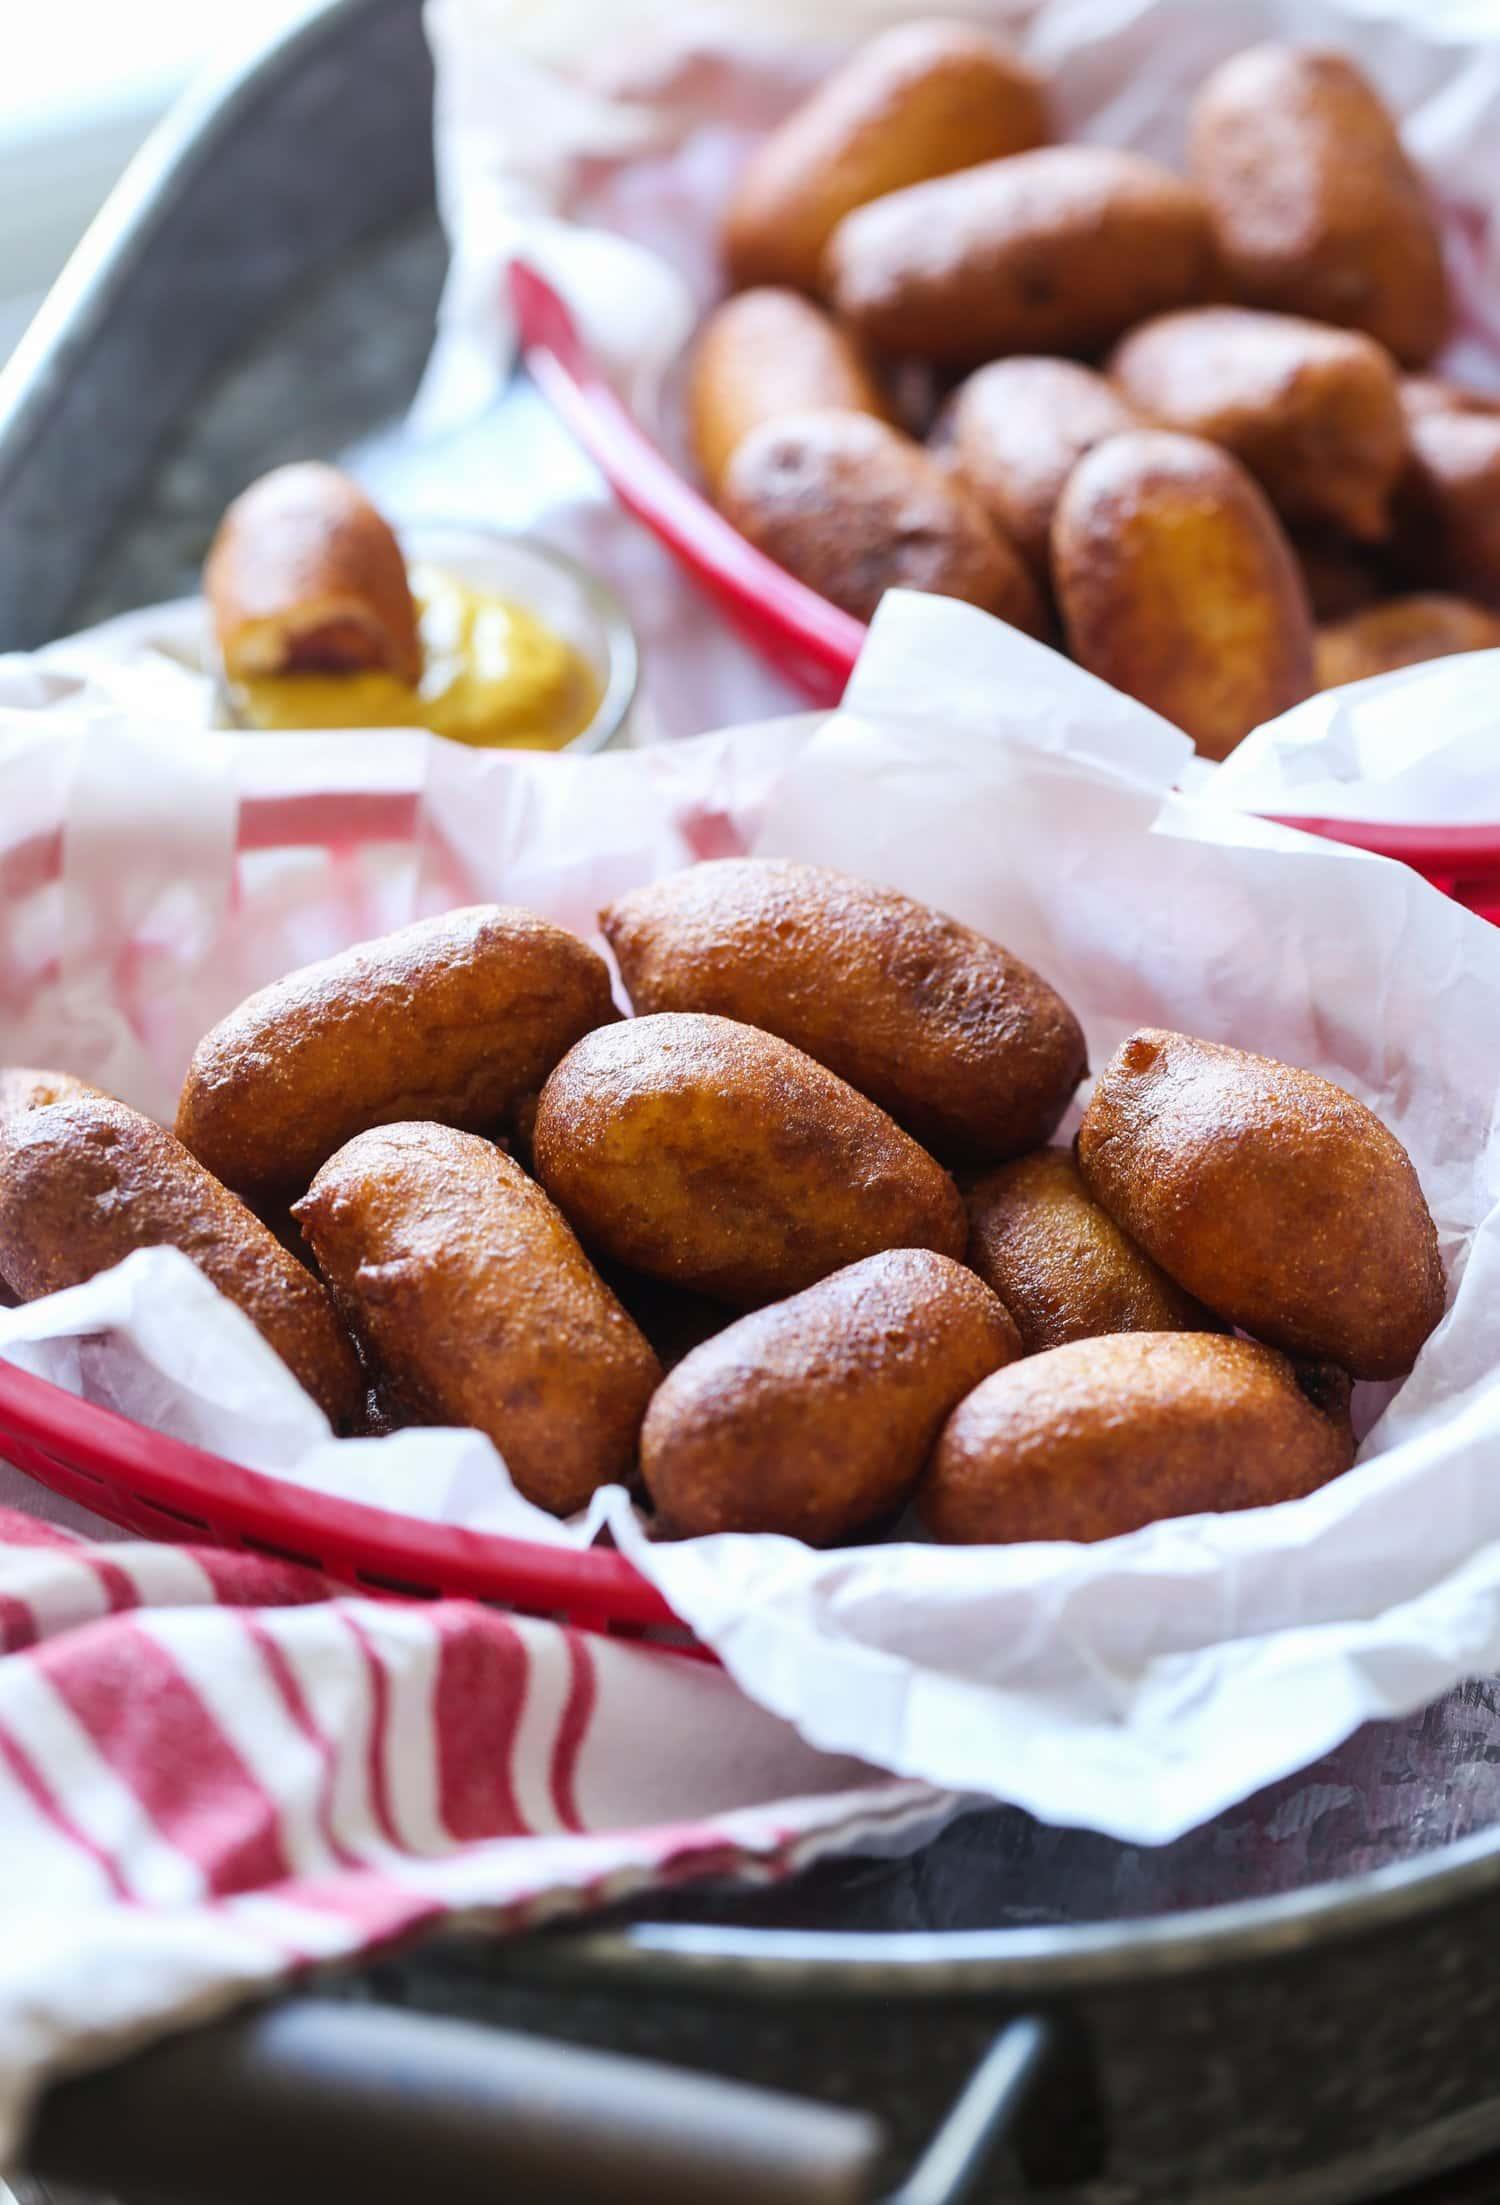 A basket of mini corn dogs with cornmeal breading.